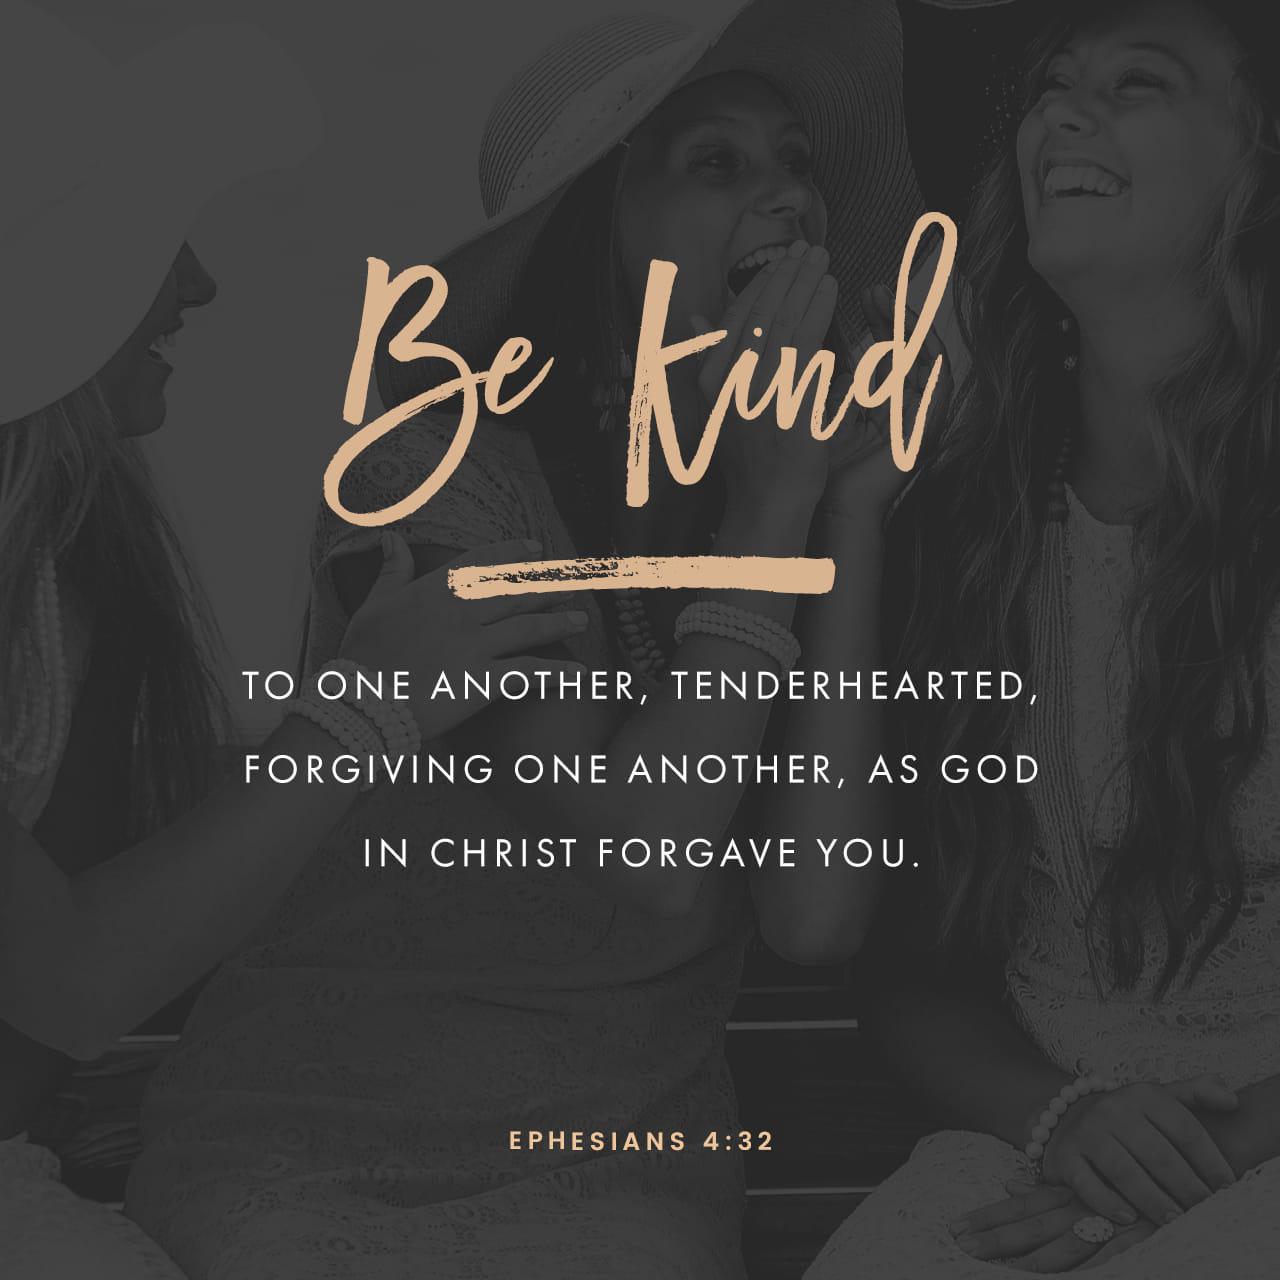 Ephesians 4:31 Get rid of all bitterness, rage, anger, harsh words, and slander, as well as all types of evil behavior.   New Living Translation (NLT)